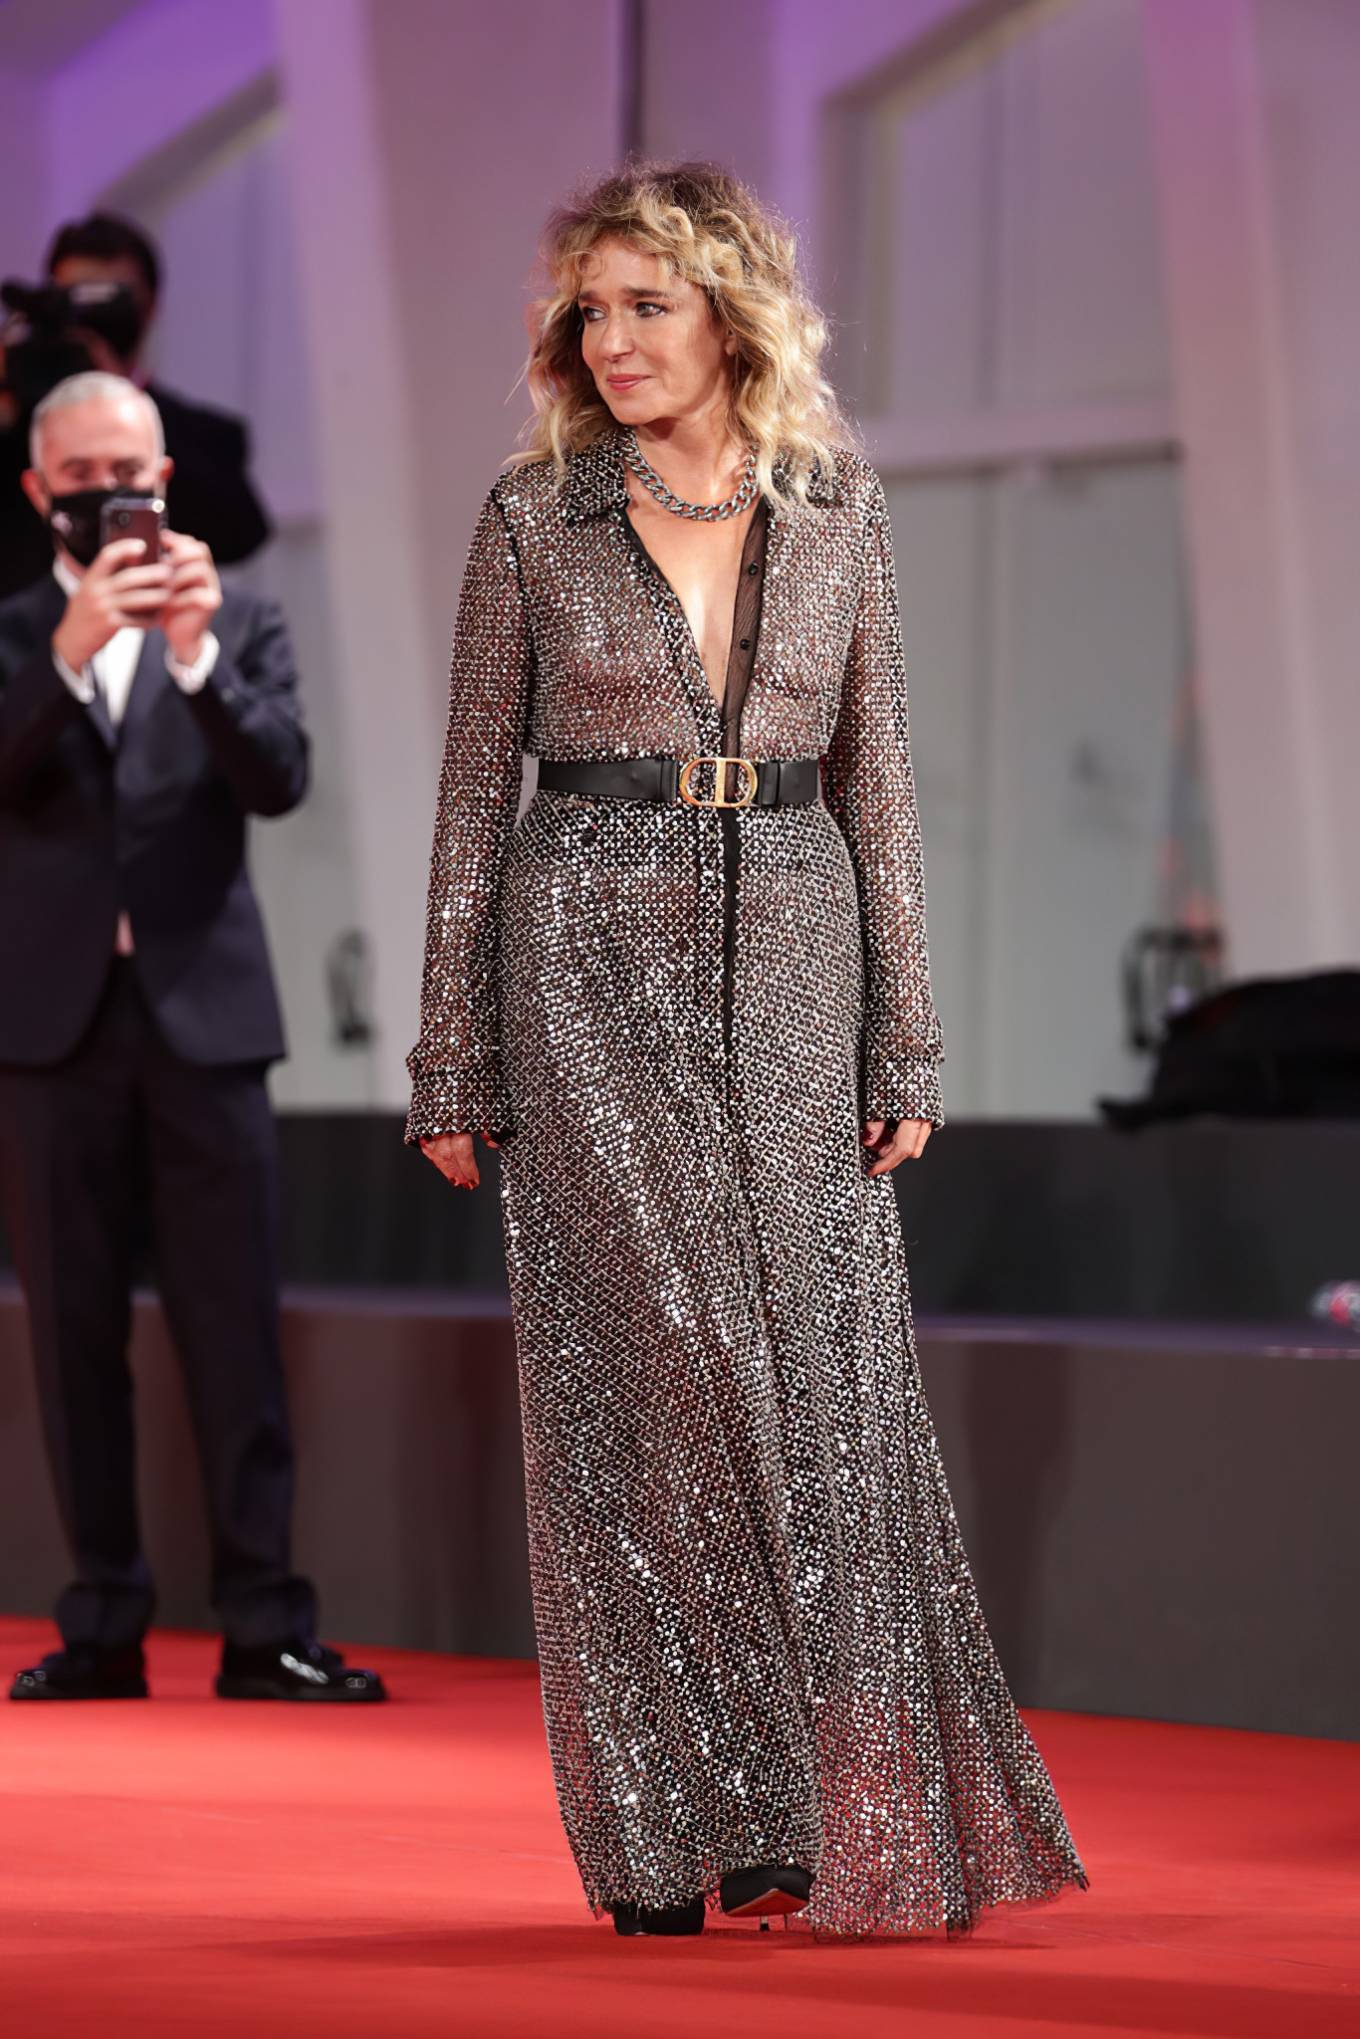 Valeria Golino 2020 : Valeria Golino – Closing Ceremony 2020 Venice Film Festival-10